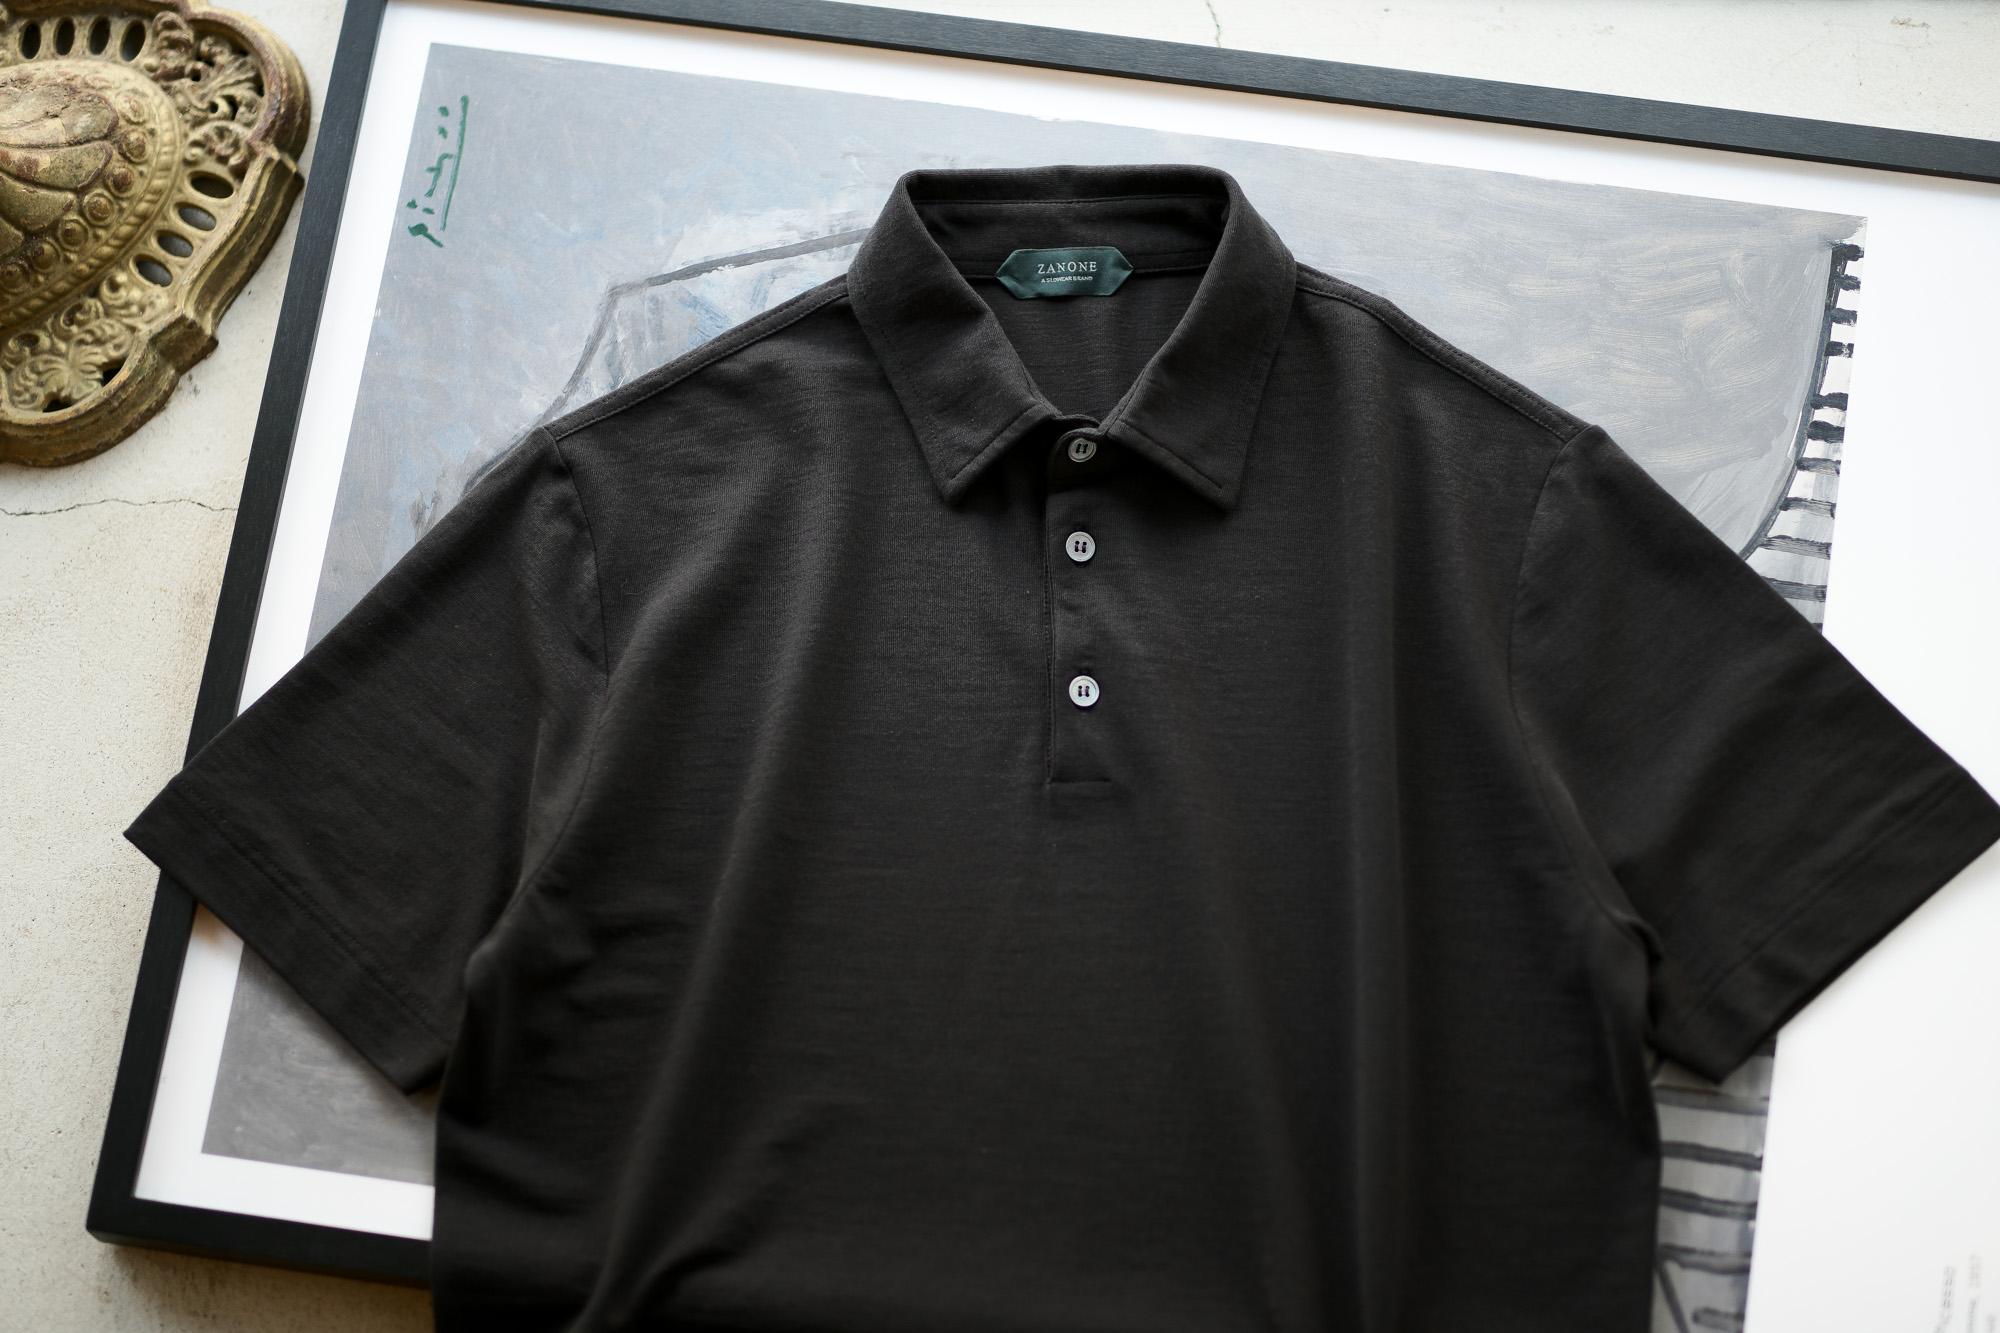 ZANONE(ザノーネ) Polo Shirt ice cotton アイスコットン ポロシャツ BLACK (ブラック・Z0015) made in italy (イタリア製) 2020春夏新作 愛知 名古屋 altoediritto アルトエデリット